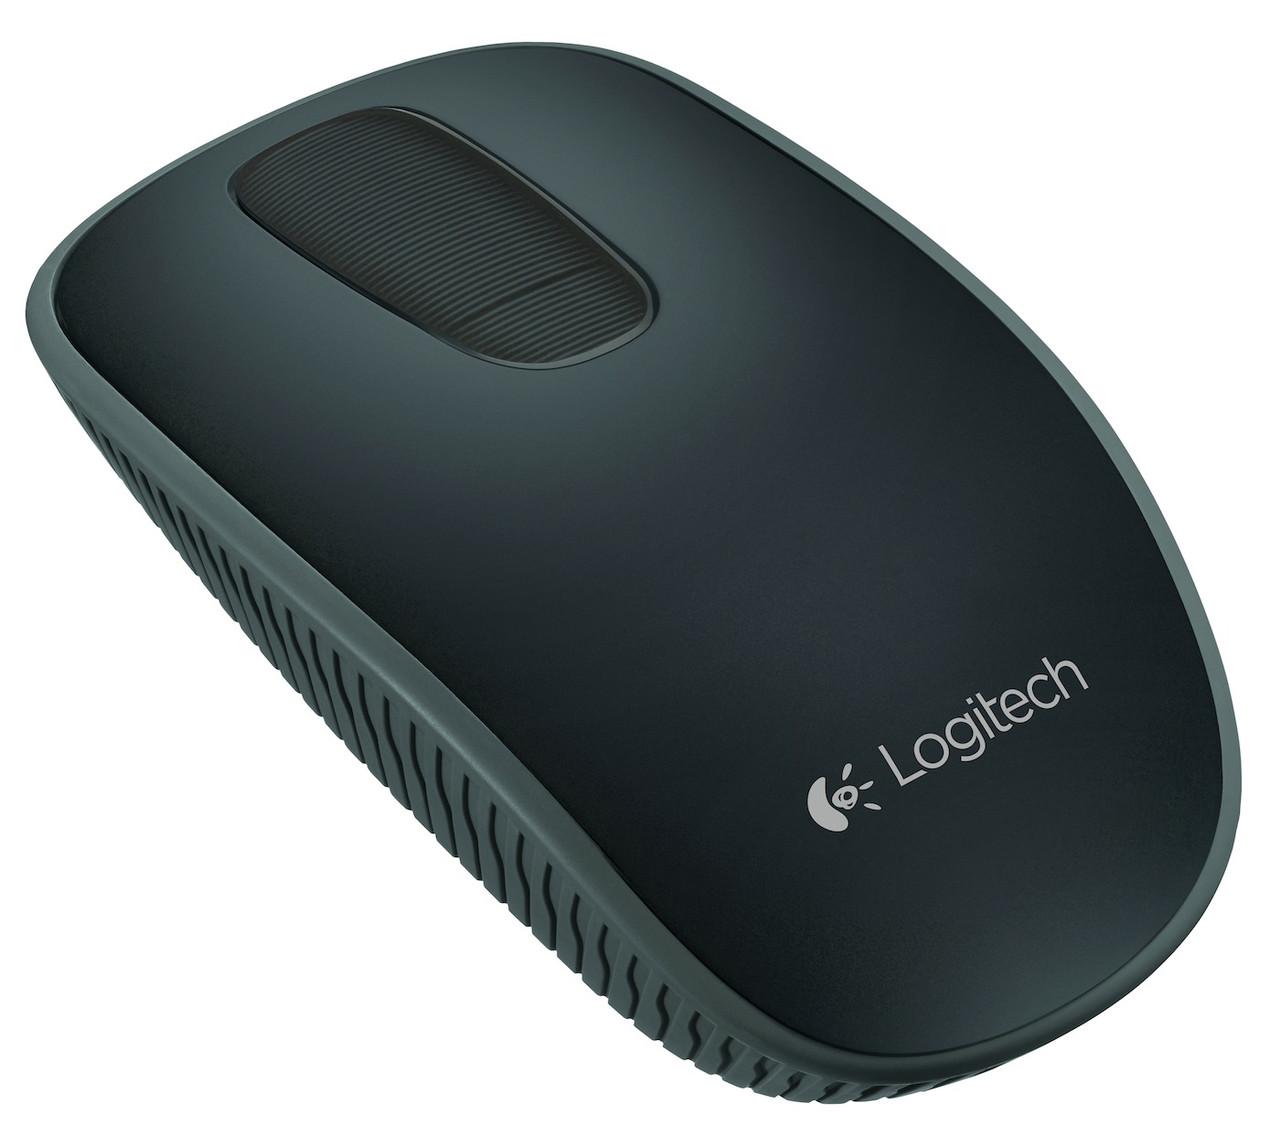 Мышка Logitech Wireless Touch Mouse T400 BLACK